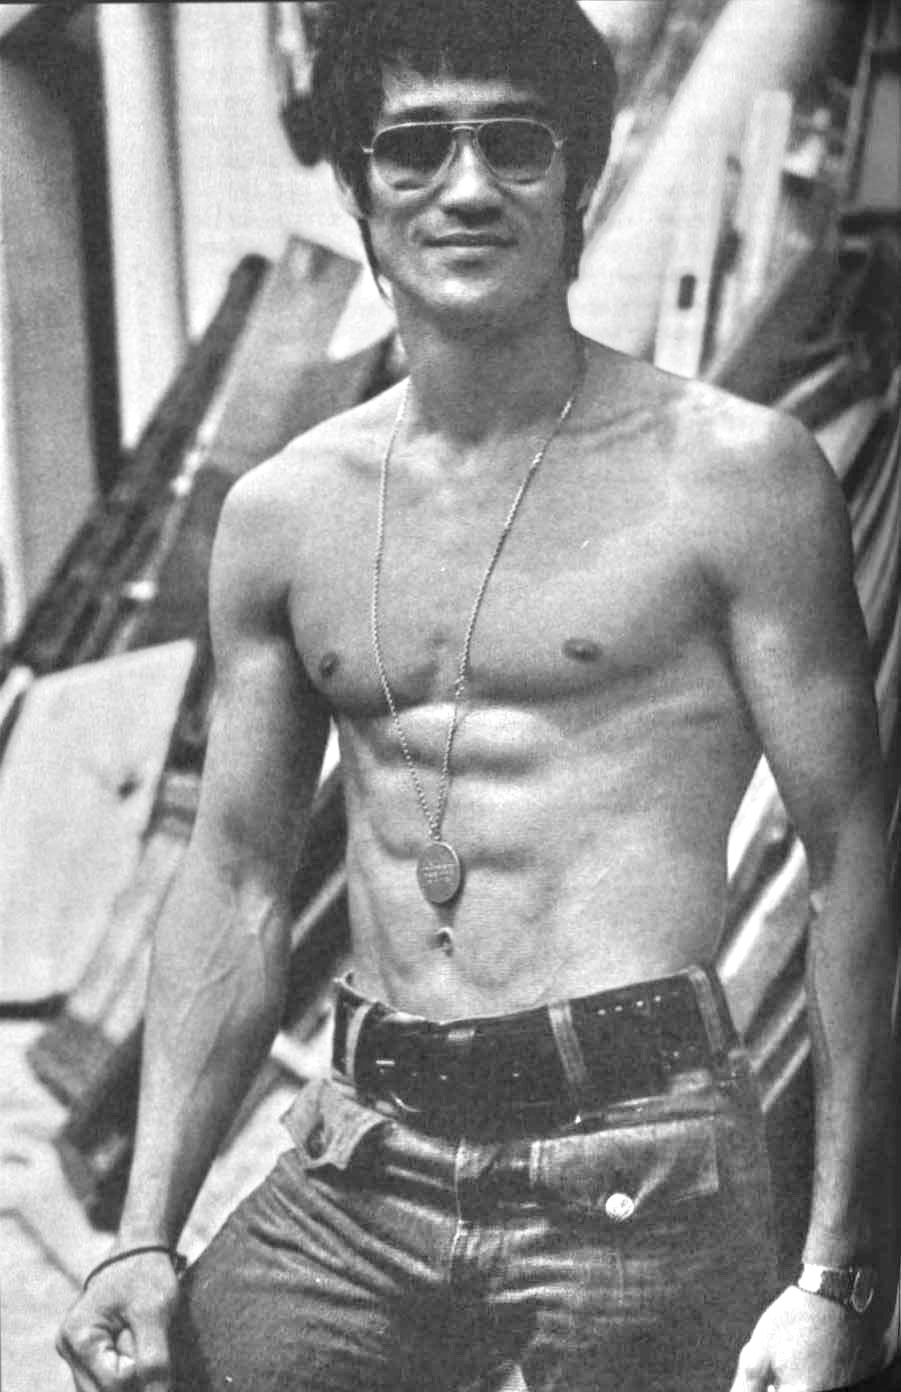 Arnold Schwarzenegger Wallpaper Quotes Być Jak Bruce Lee Czy To Możliwe Co W Og 243 Le Znaczy Quot Być